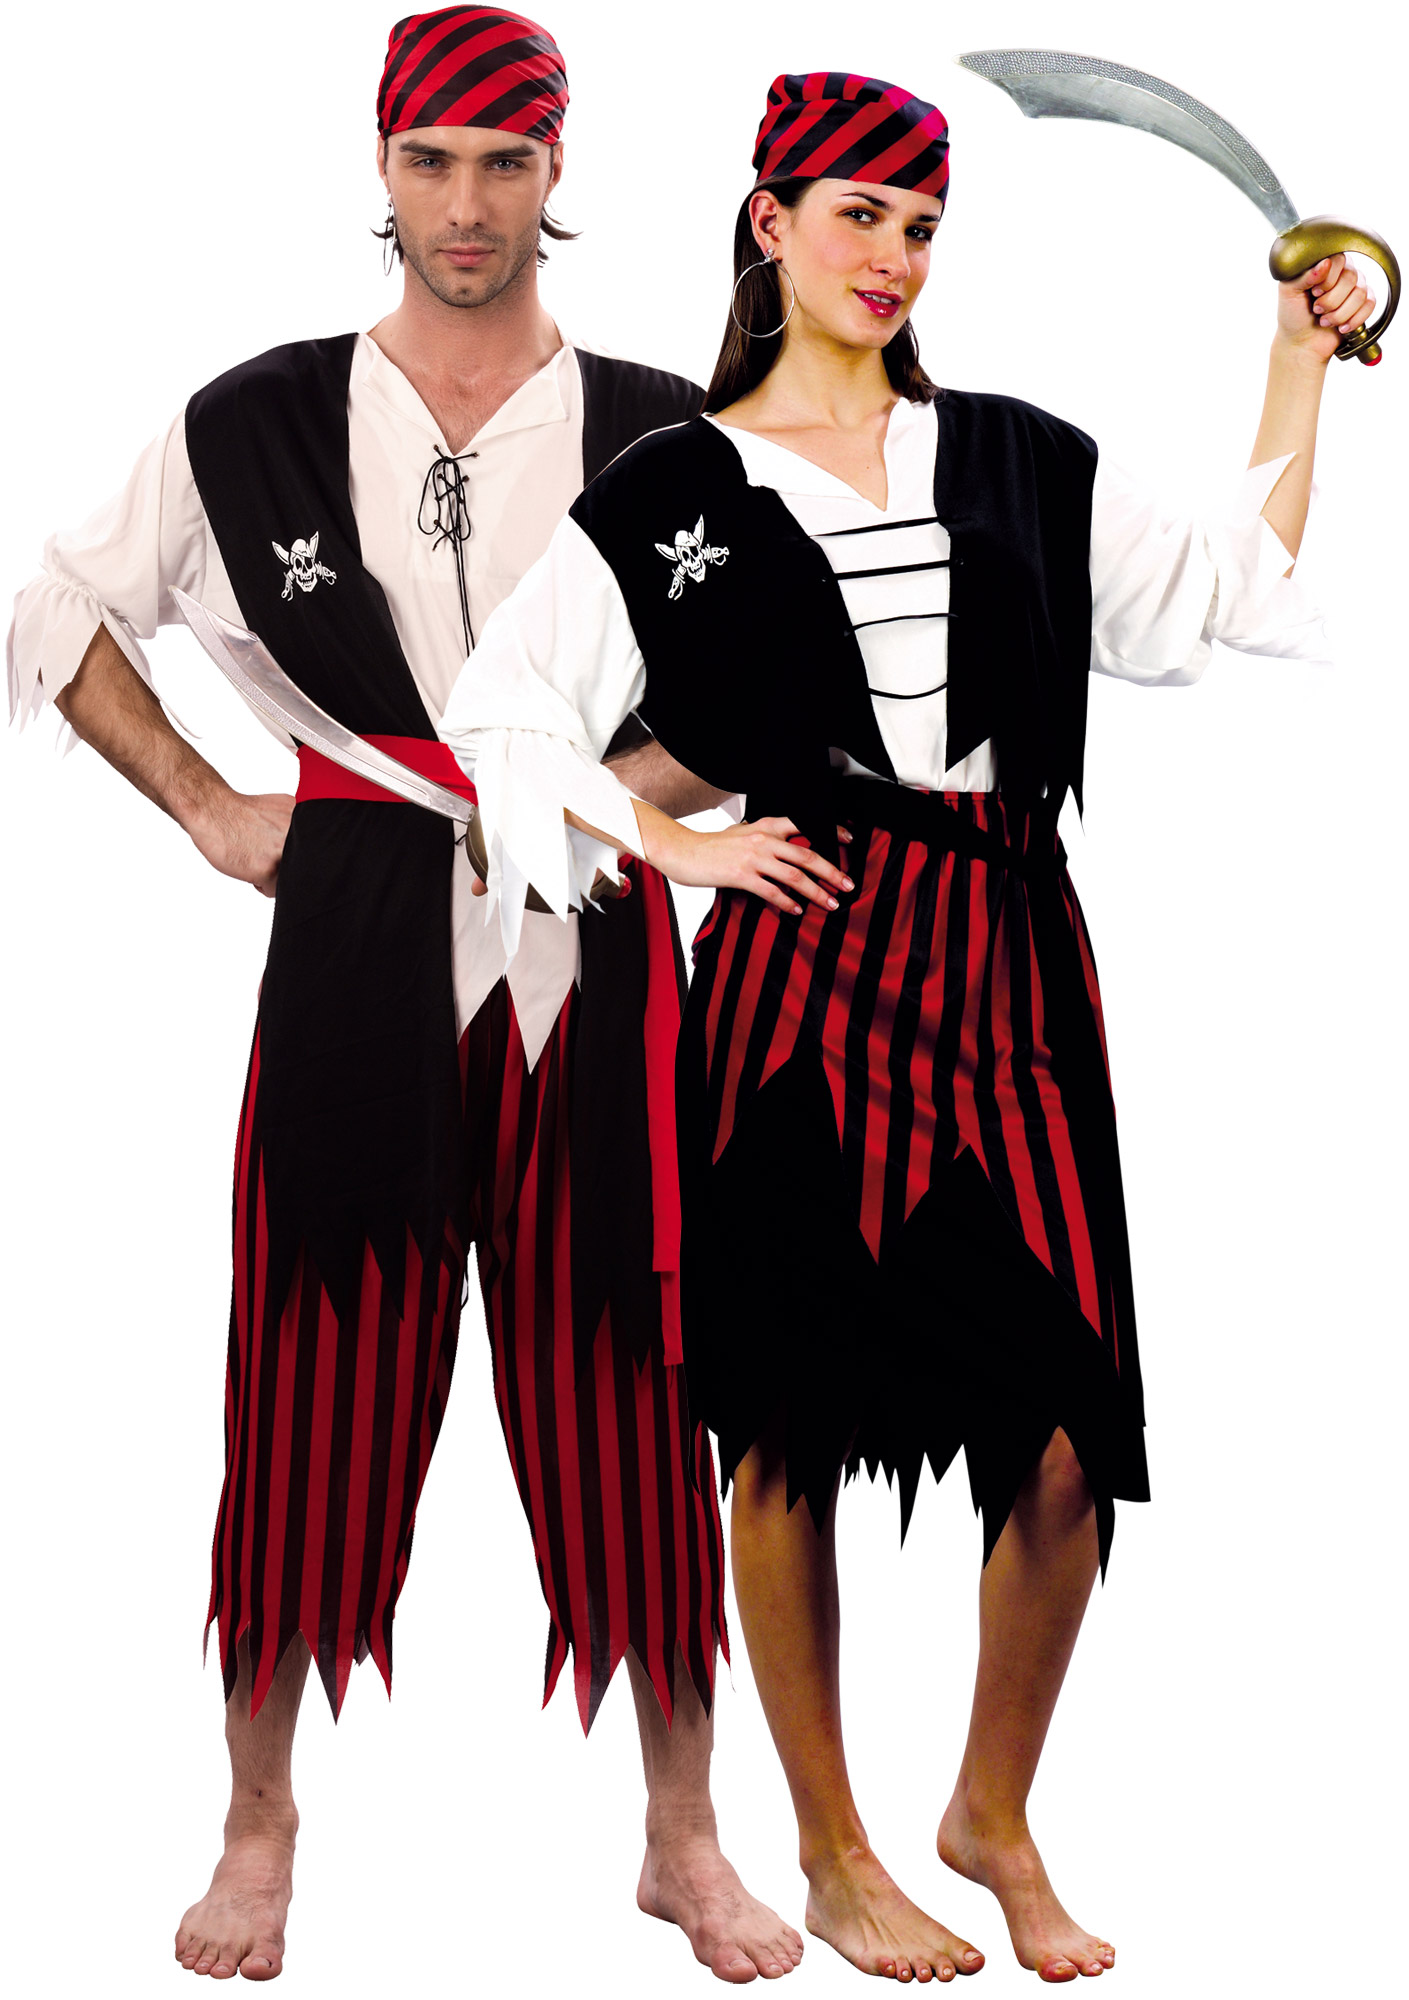 Goatee Halloween Costumes